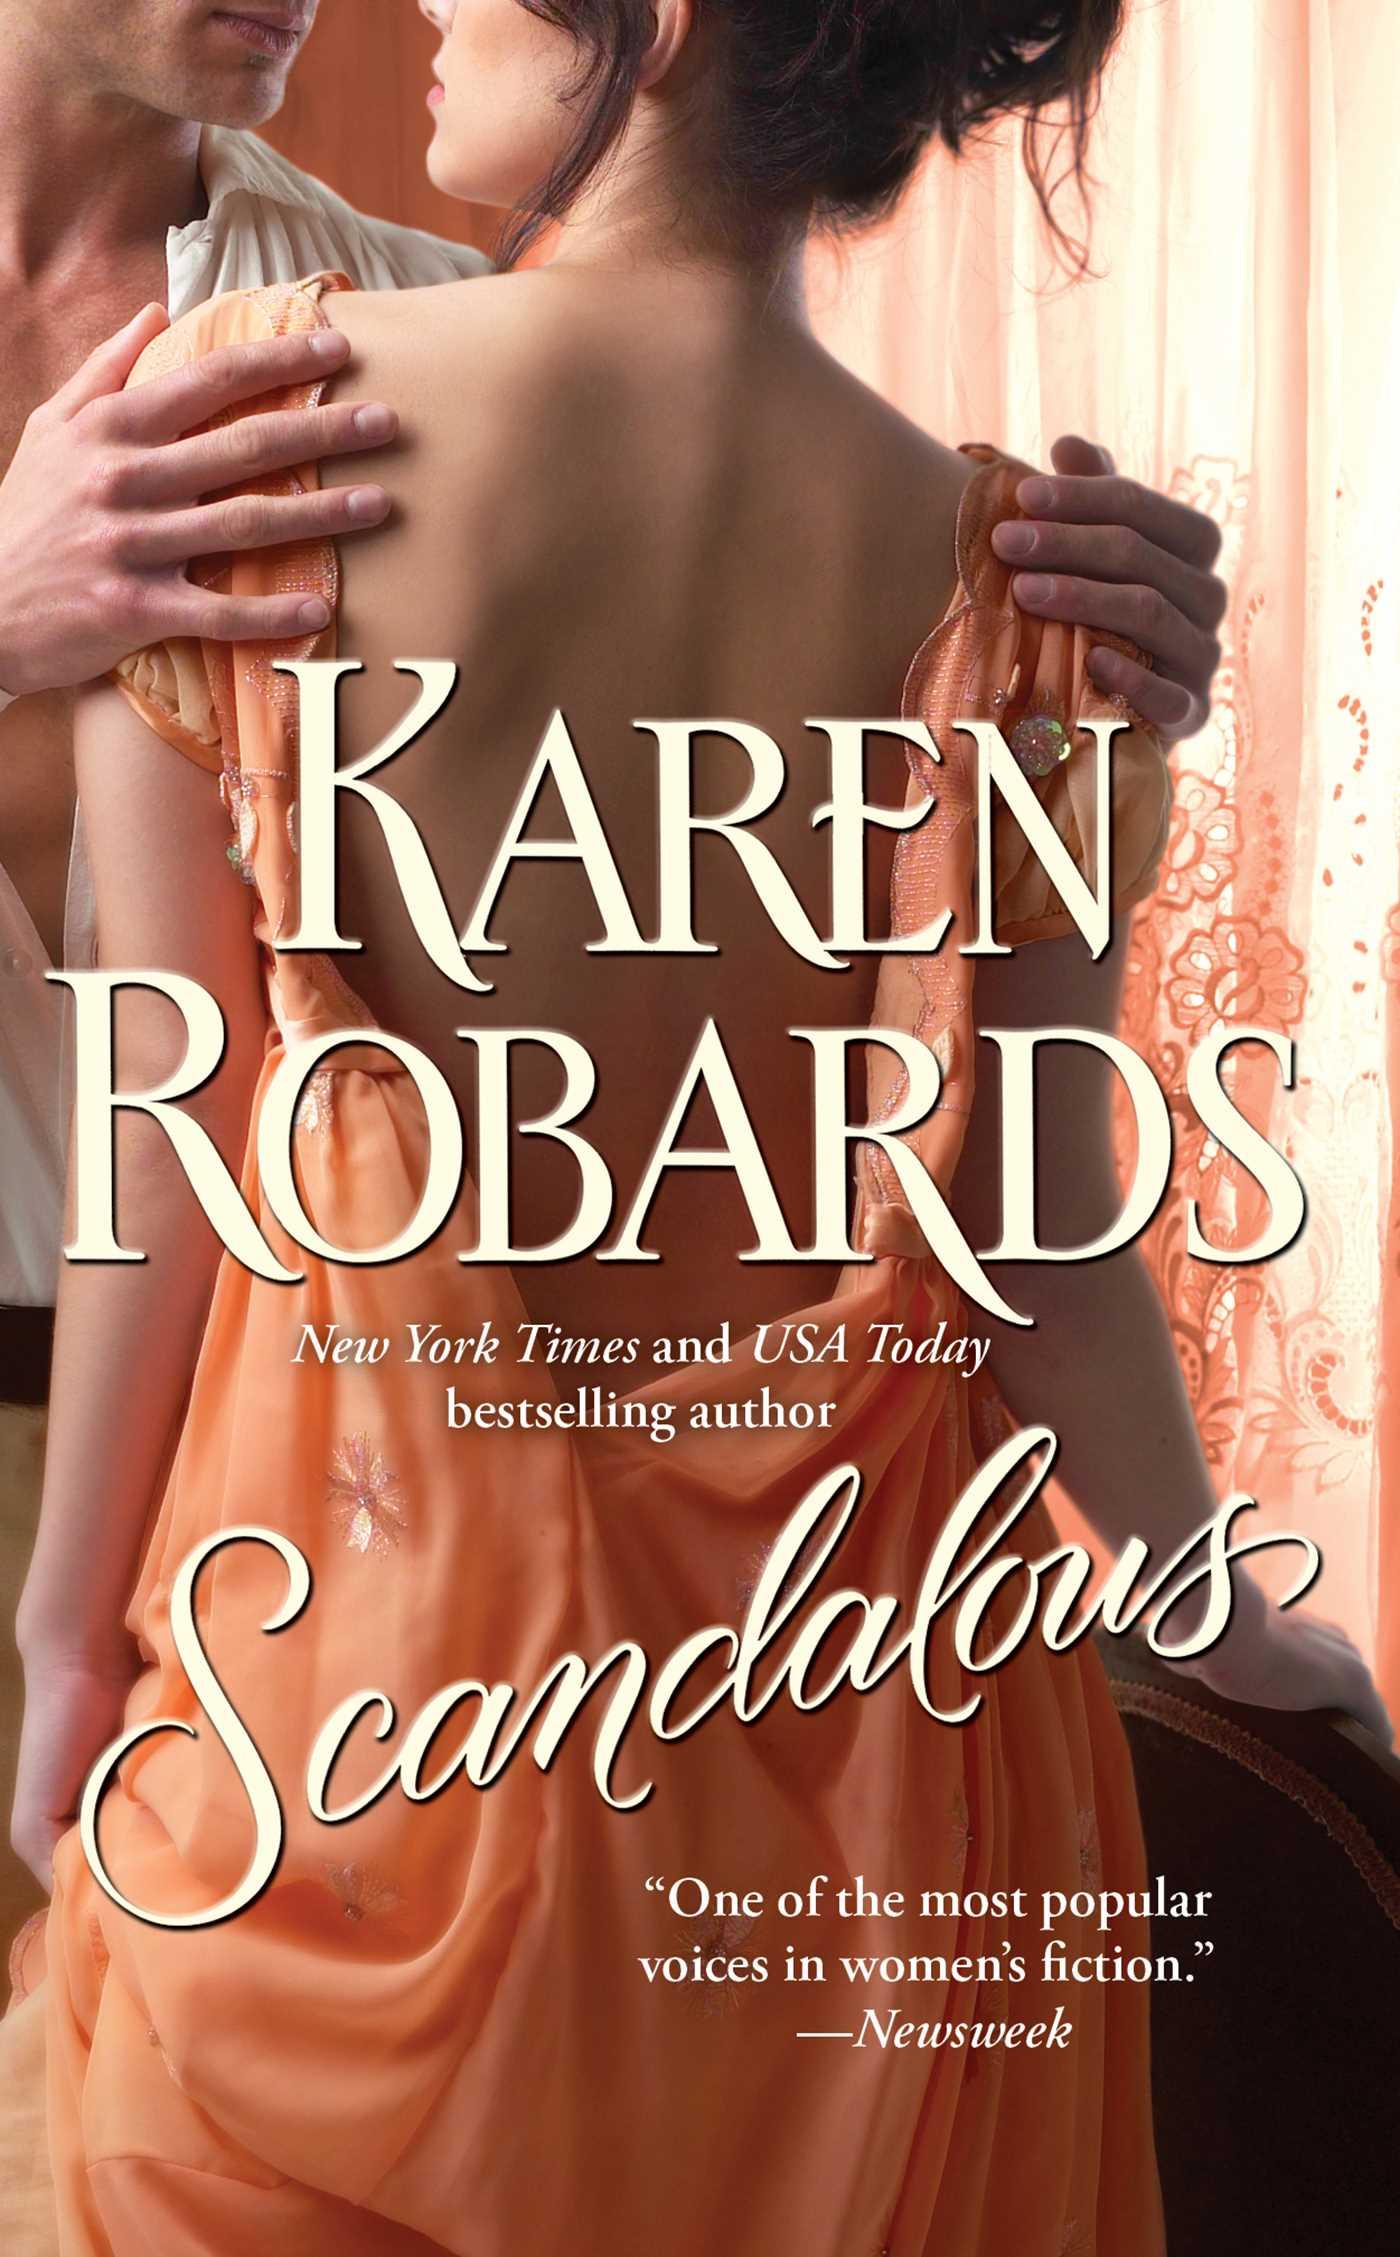 Scandalous 9780743424523 hr